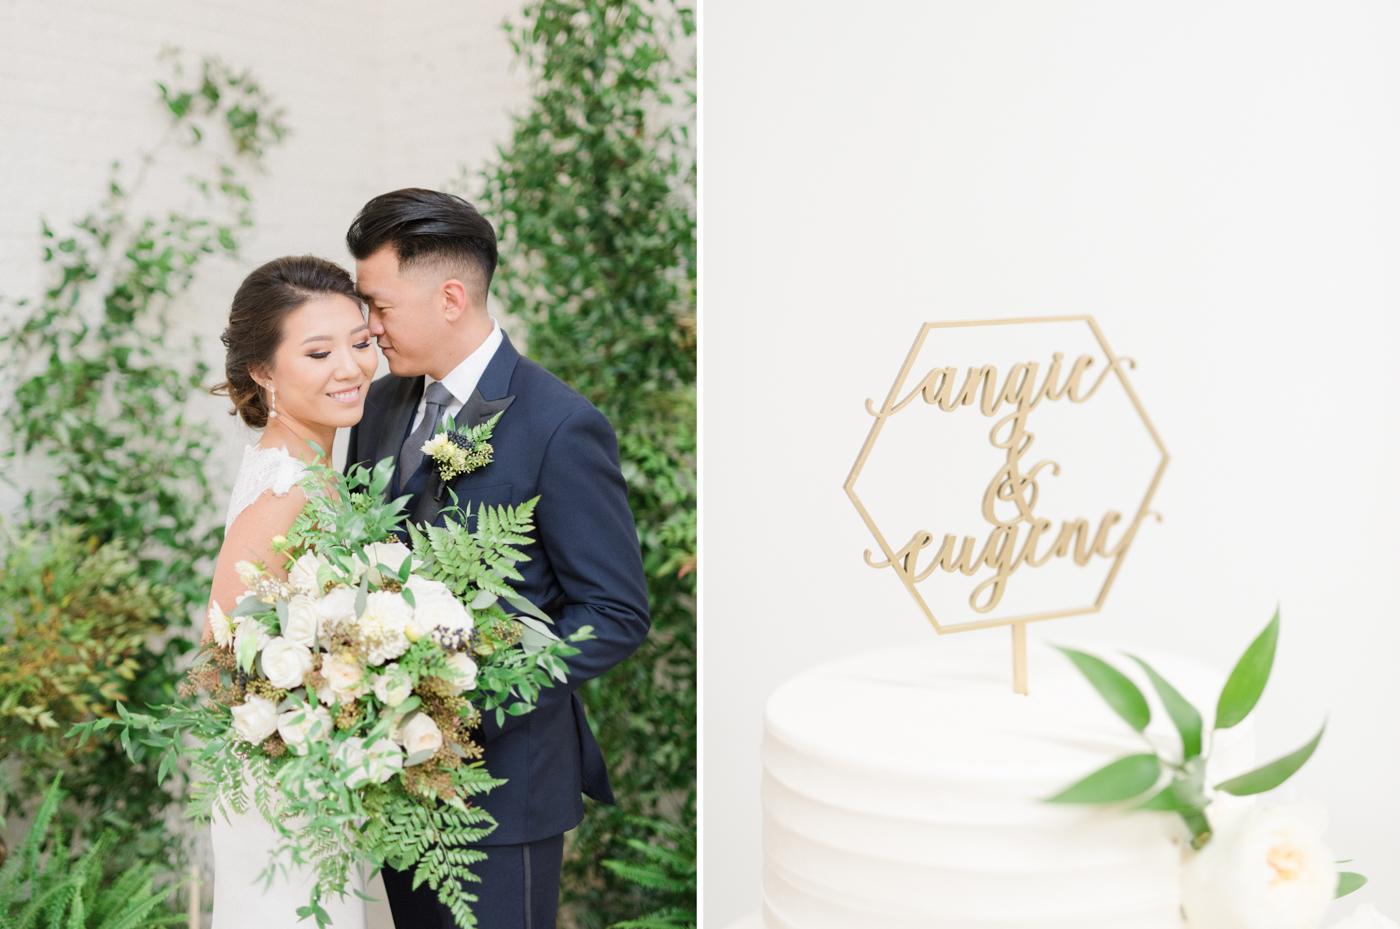 Modern_Wedding_HNYPT_Honeypot_LA_Photographer_Los_Angeles-35.jpg